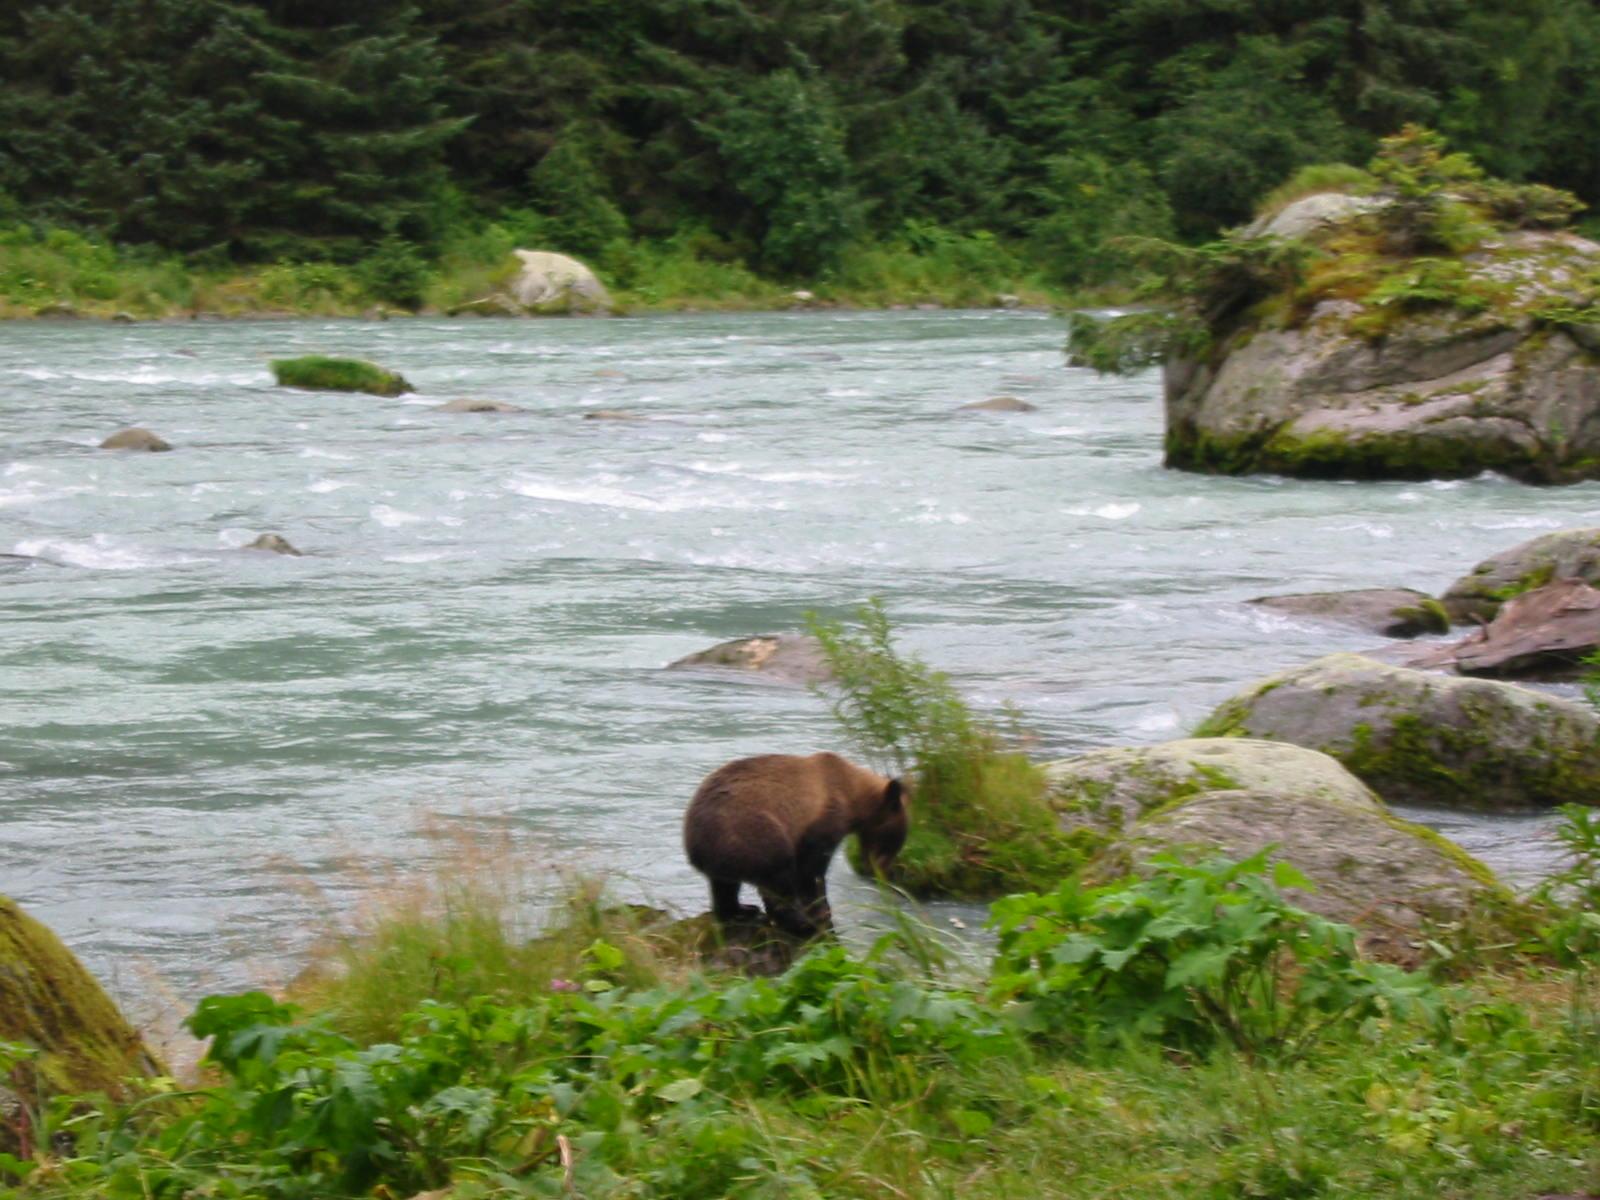 Click image for larger version  Name:Alaska 2006_20060813_532.JPG Views:57 Size:268.1 KB ID:73734